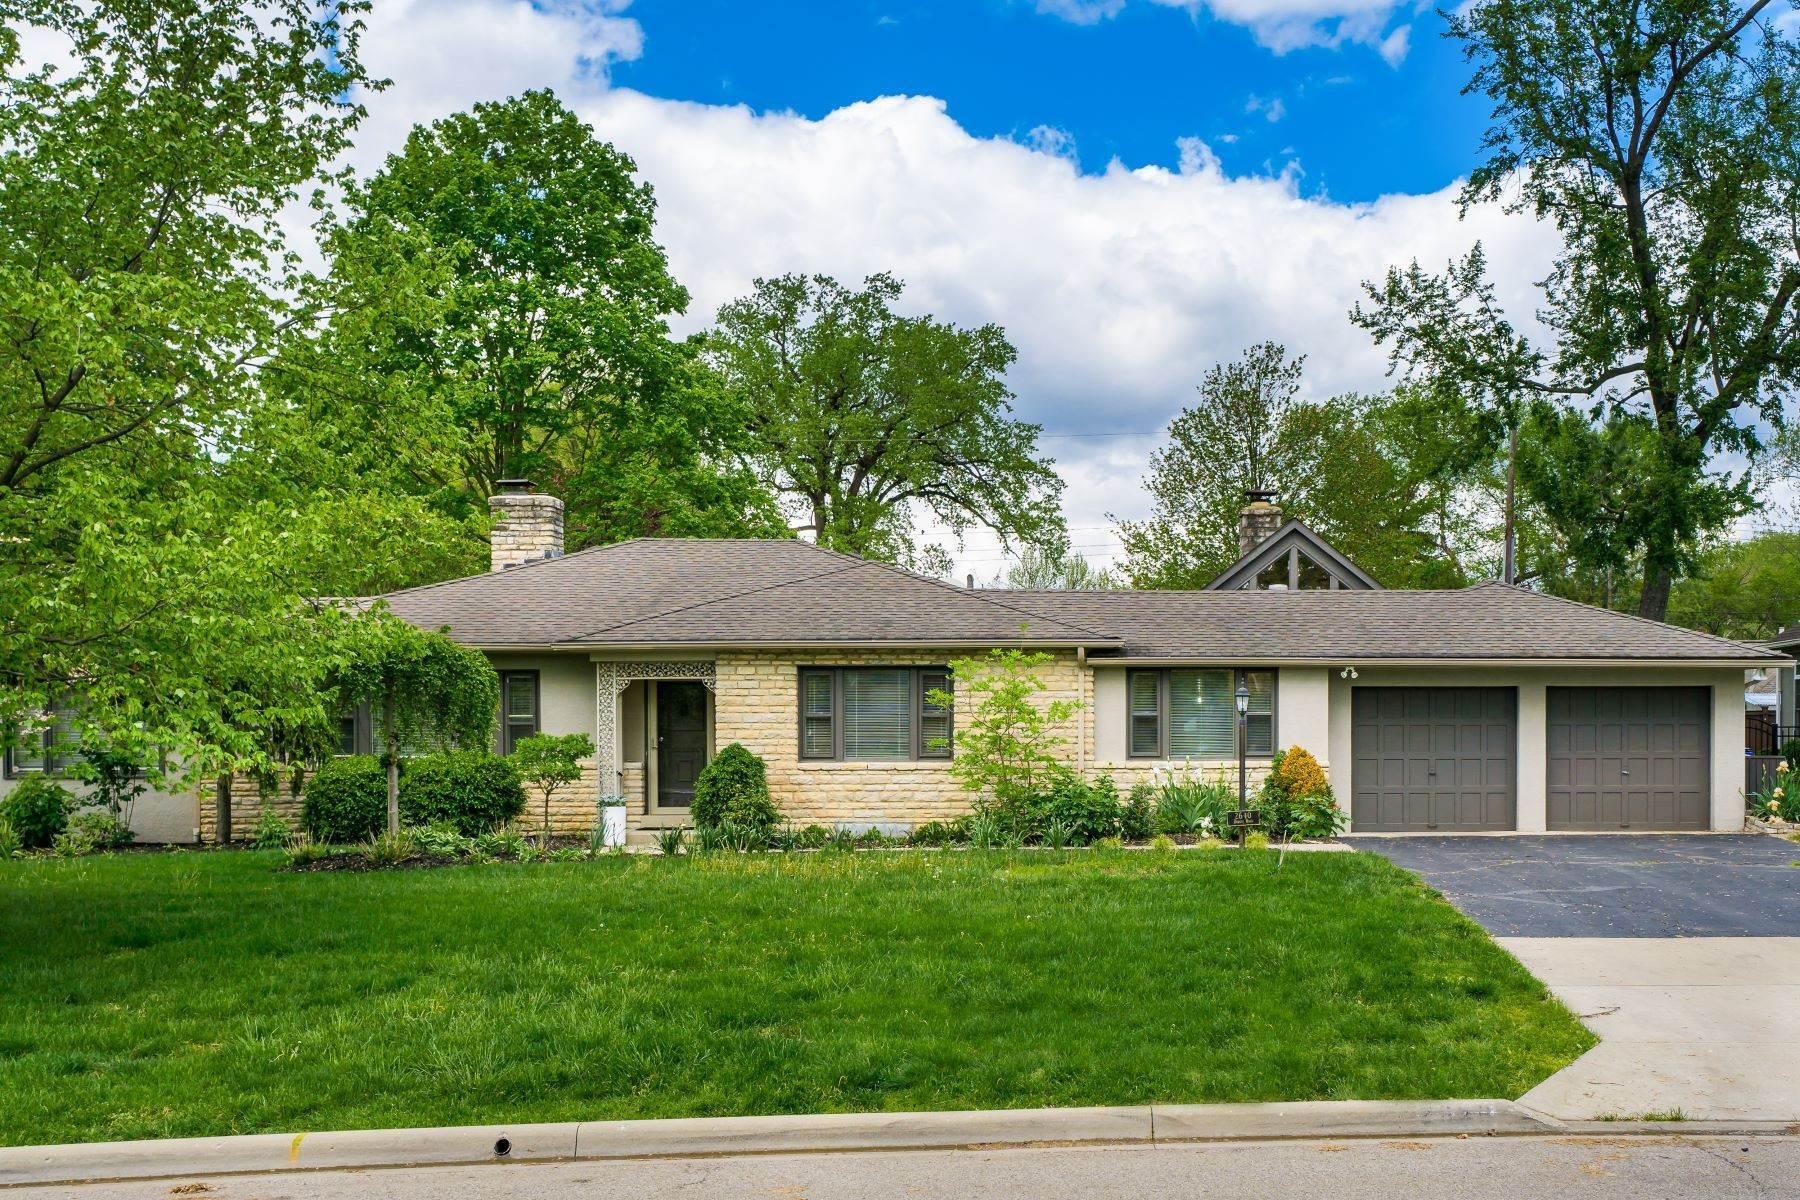 Single Family Homes for Sale at 2640 Dorset Road Columbus, Ohio 43221 United States